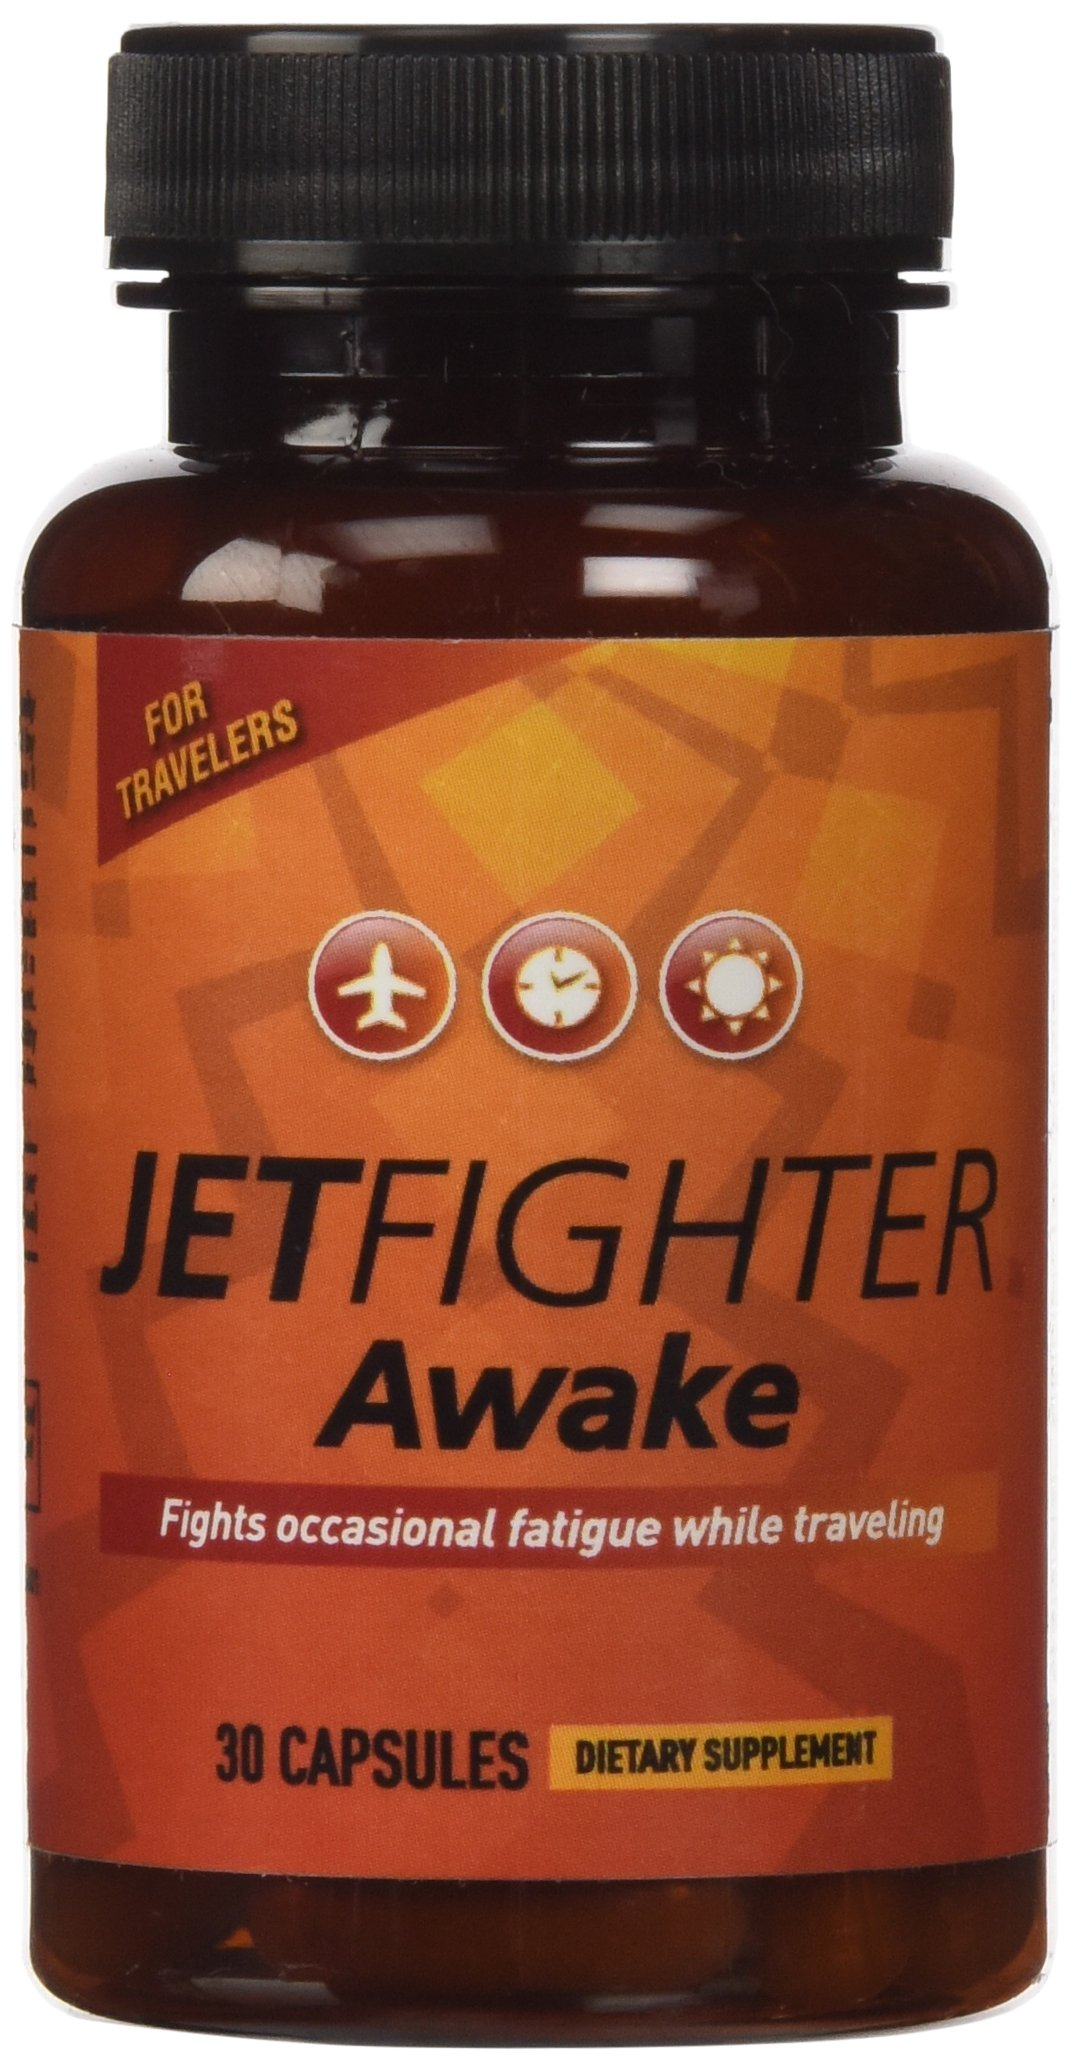 JetFighter Awake - 30 capsules - Jet Lag Relief Supplement - Combats Daytime Sleepiness - Helps Regulate Circadian Rhythm - Contains Caffeine - Works Best with JetFighter Sleep